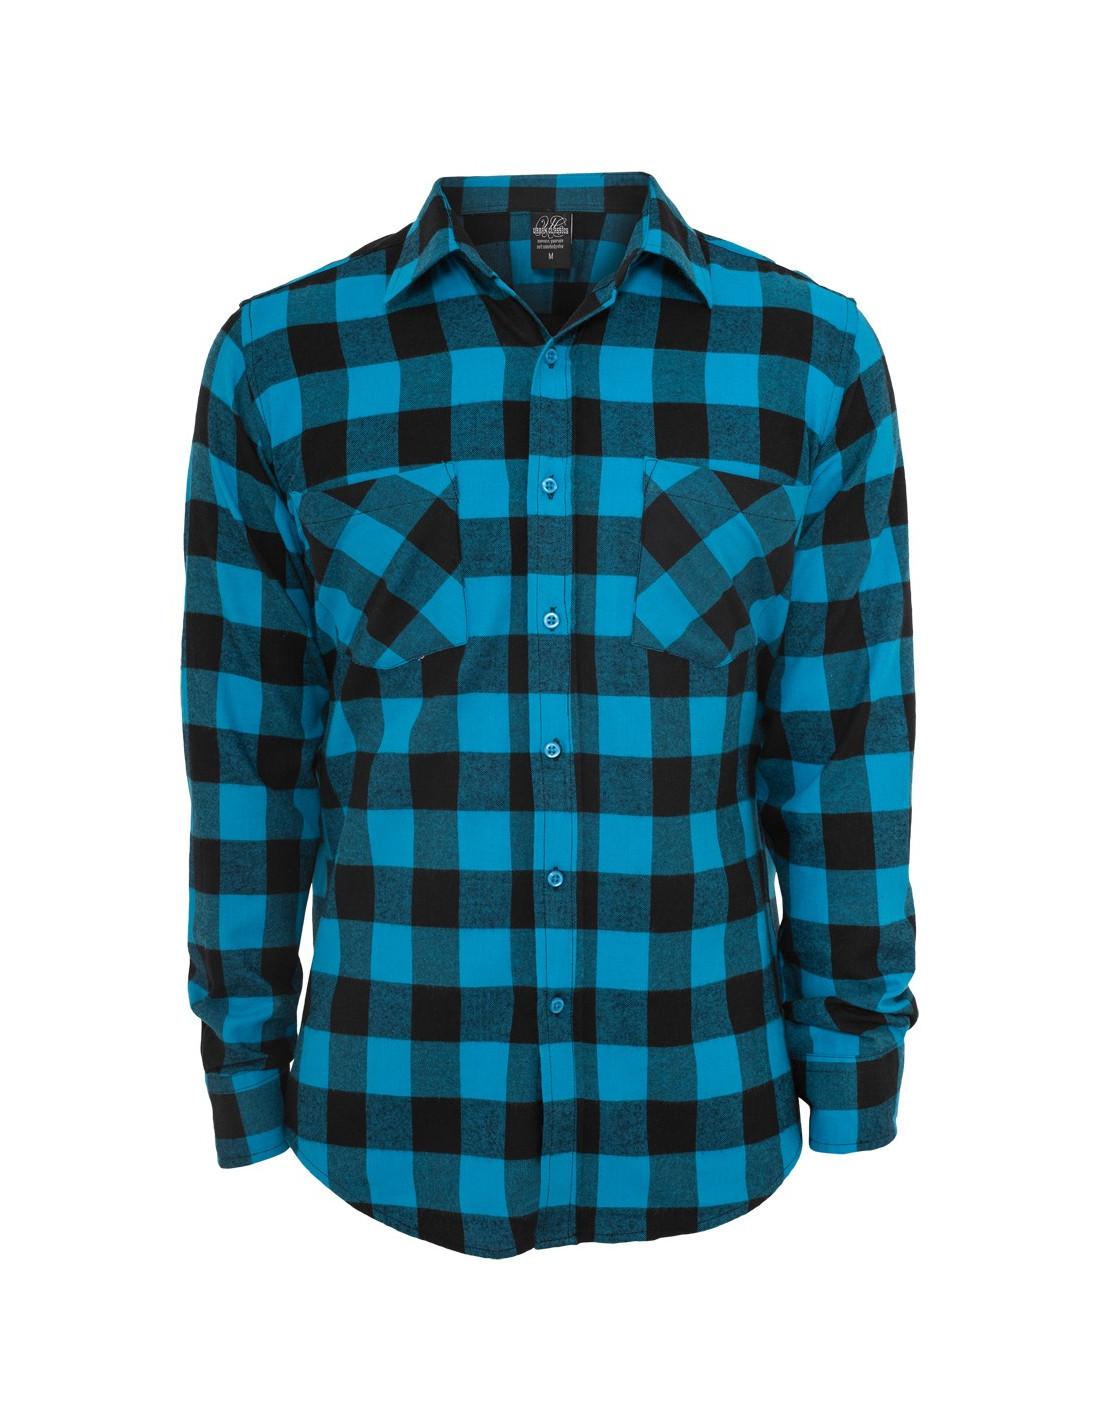 Checked Flanell Shirt Black Turquis